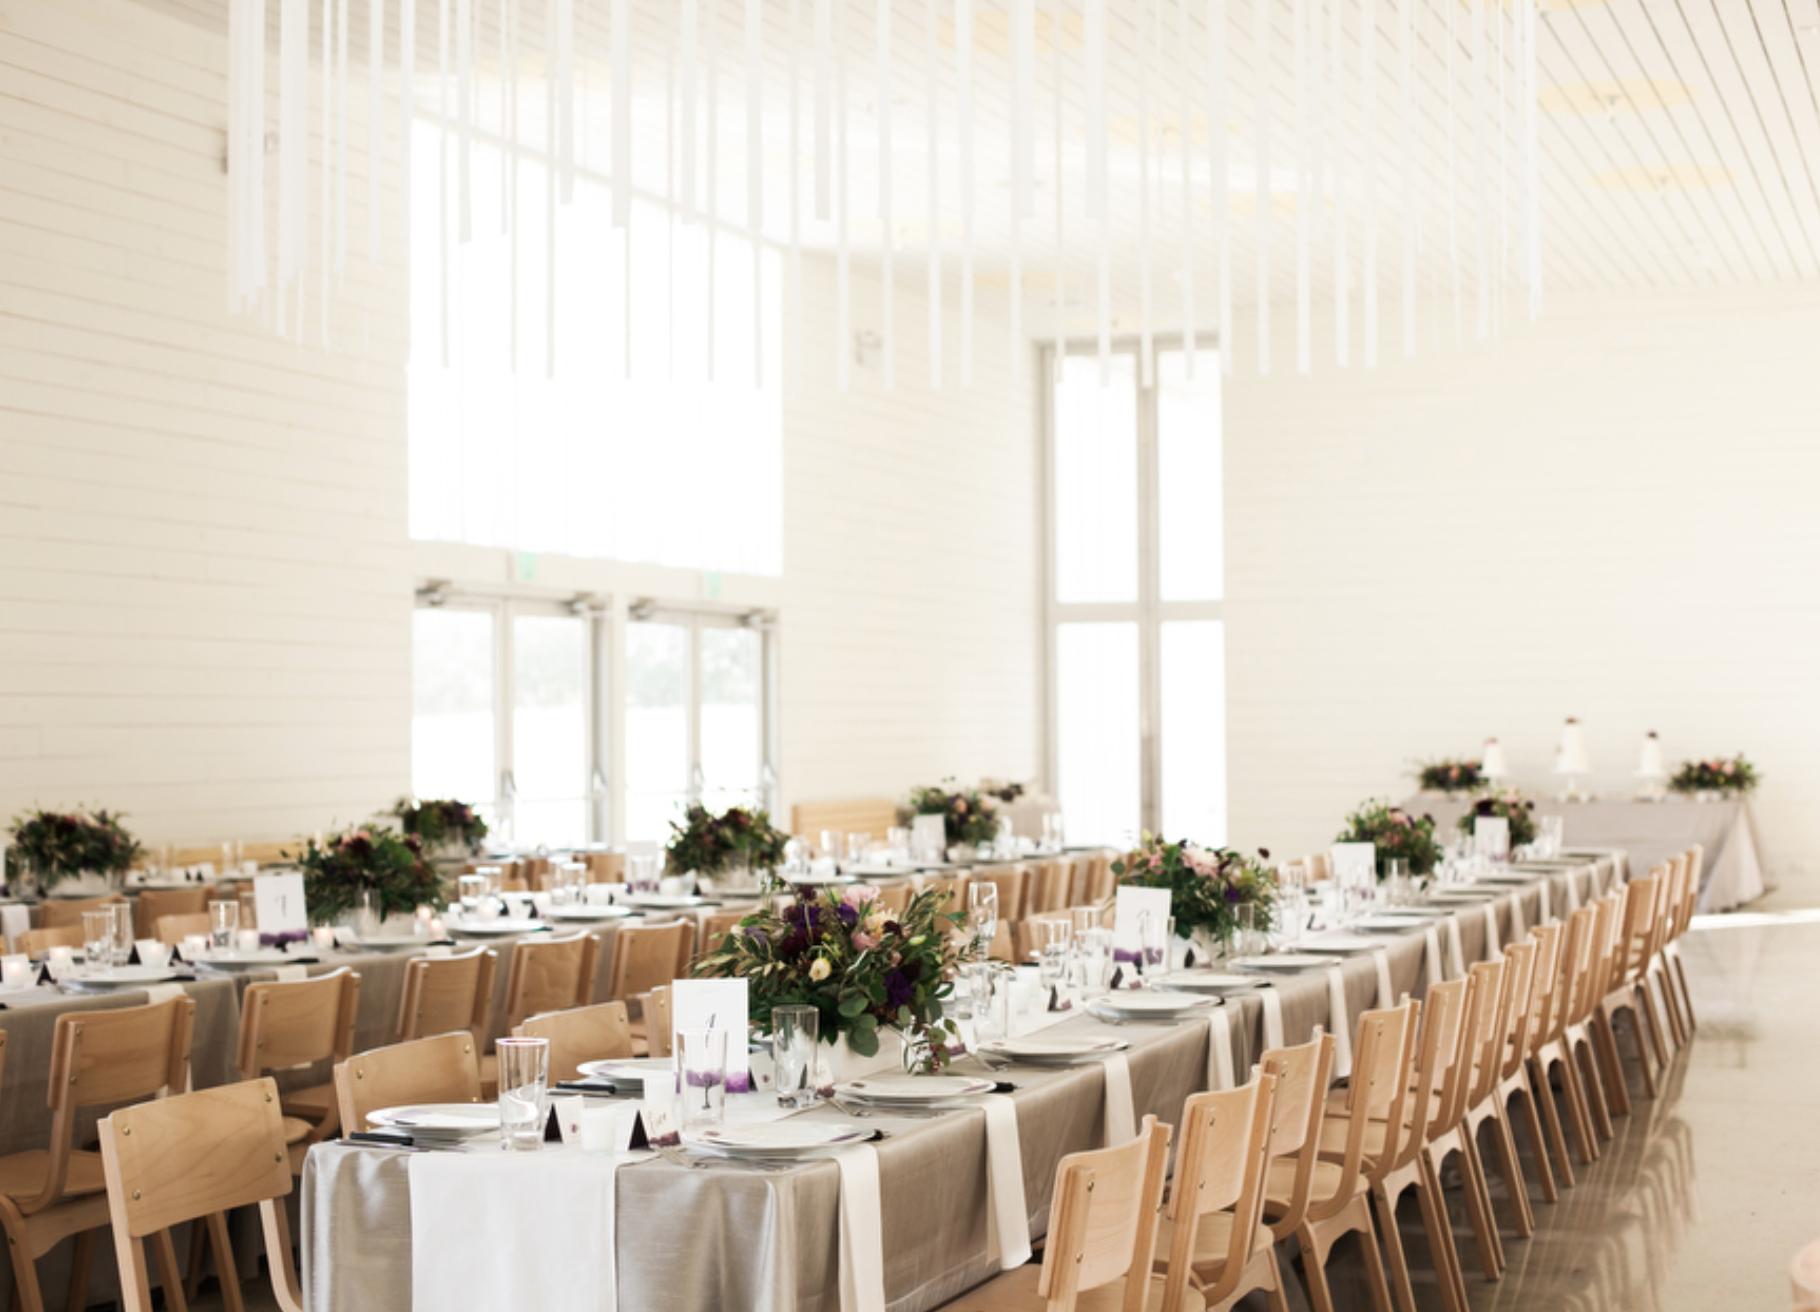 Modern wedding decor images  Idea for dessert table  not the rest of it  L  M Wedding Decor